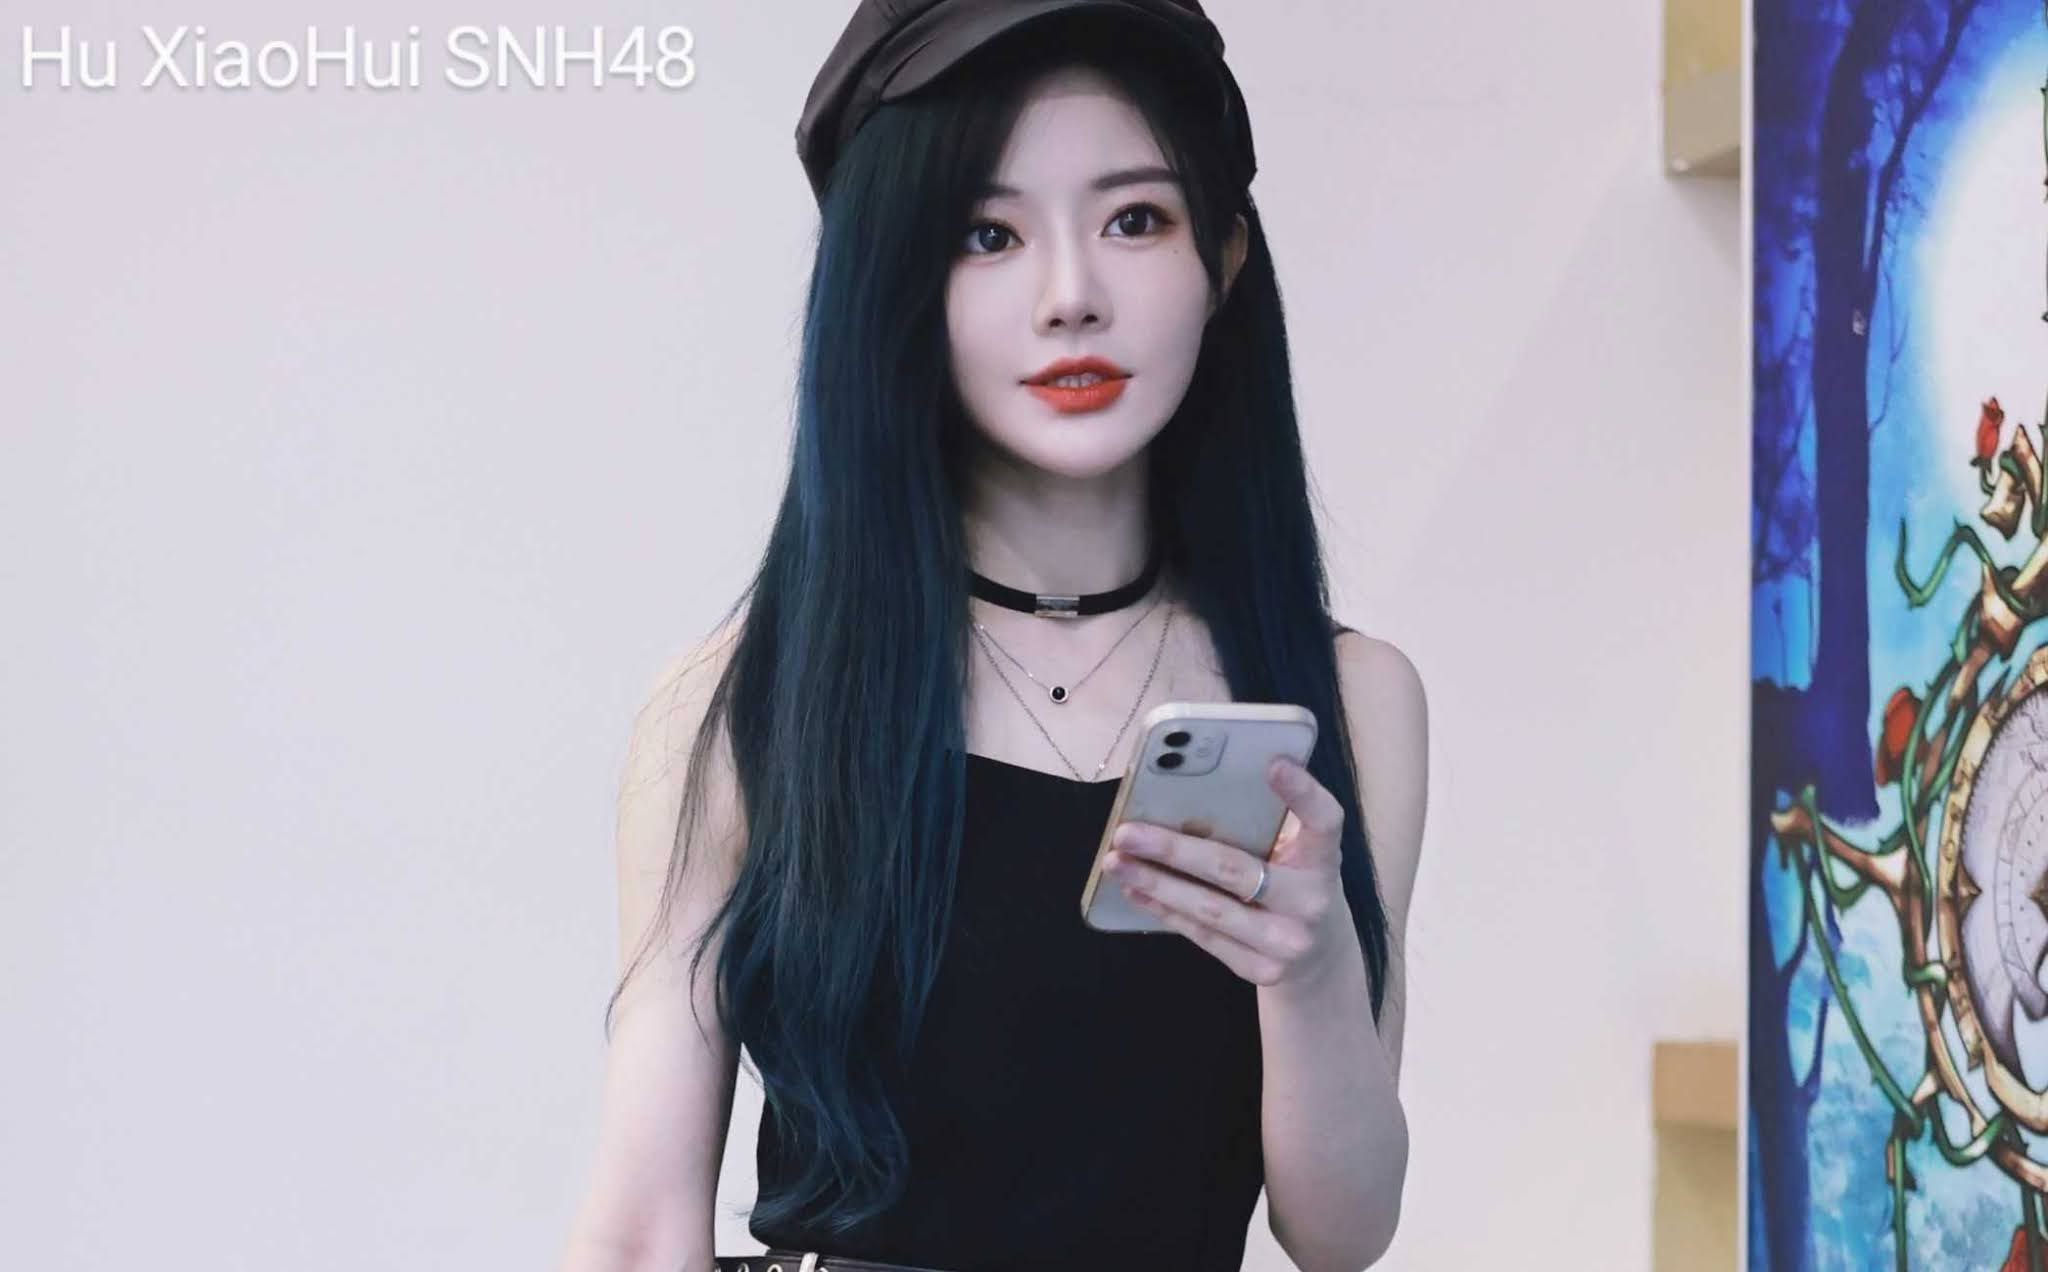 snh48 hu xiaohui graduate